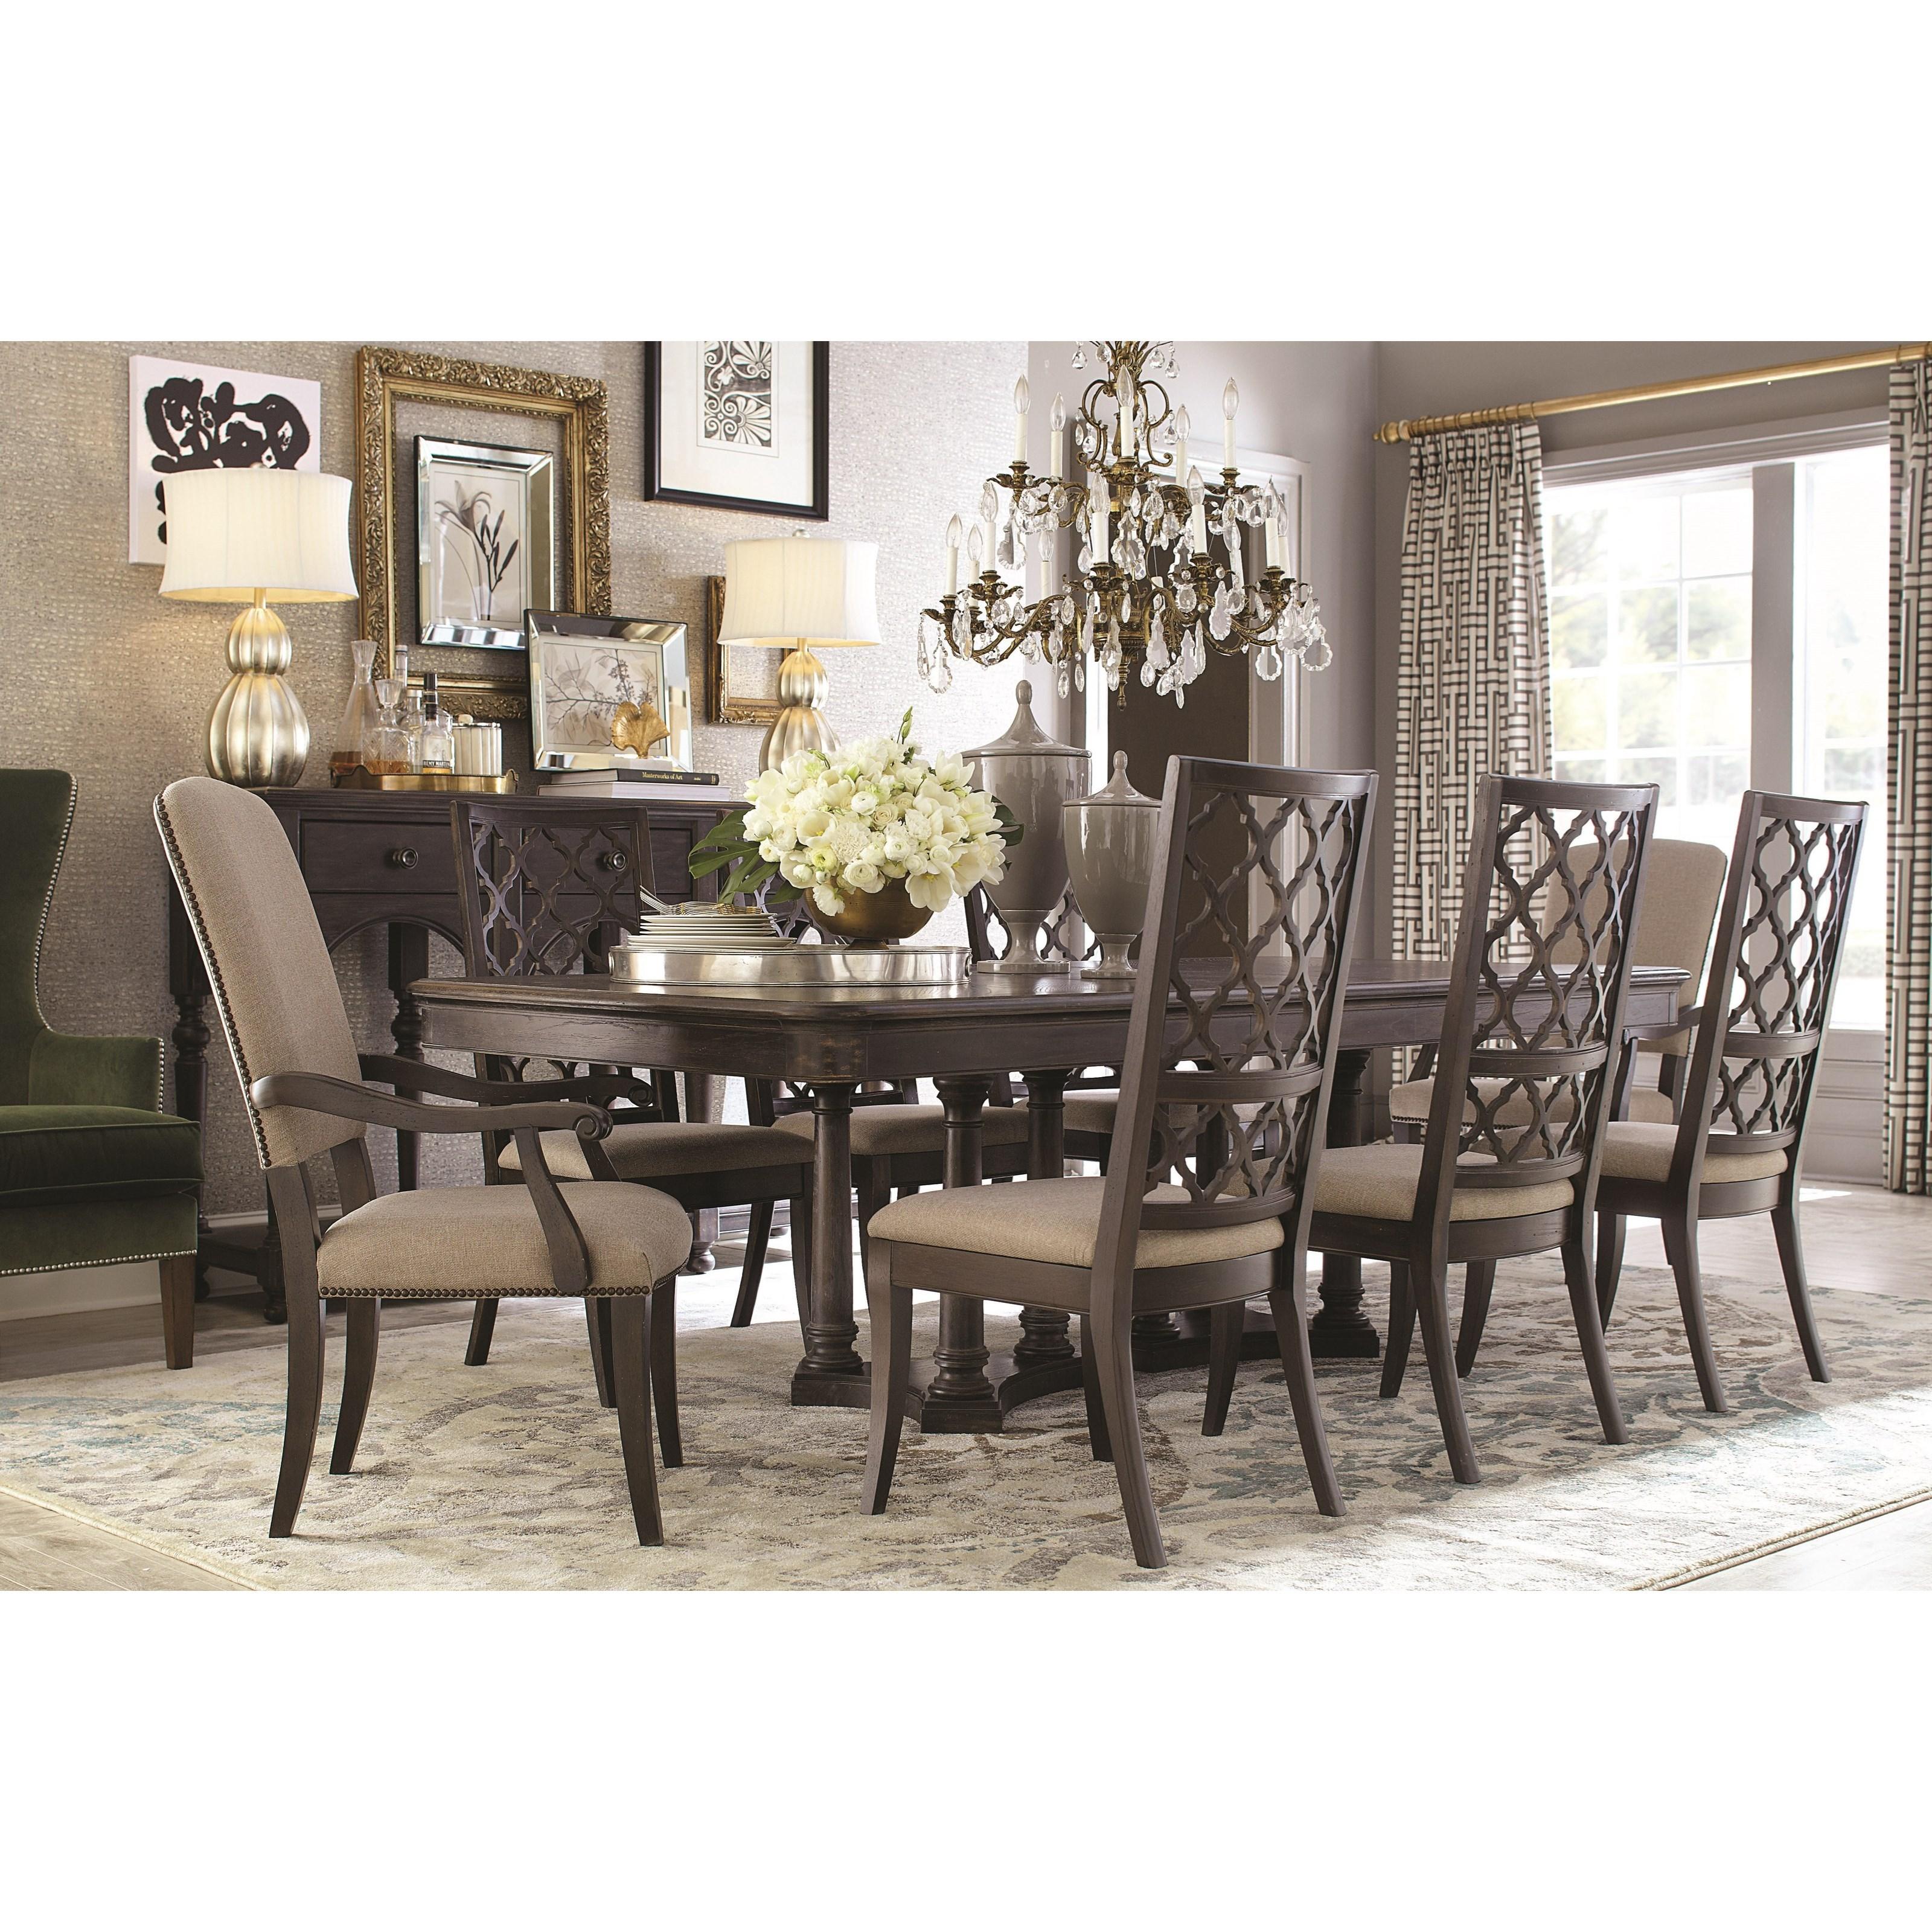 Bassett Emporium Rectangular Dining Table seats up to 10  : products2Fbassett2Fcolor2Femporium20by20bassett4513 tb462B4676 b5 from www.beckerfurnitureworld.com size 3200 x 3200 jpeg 1731kB